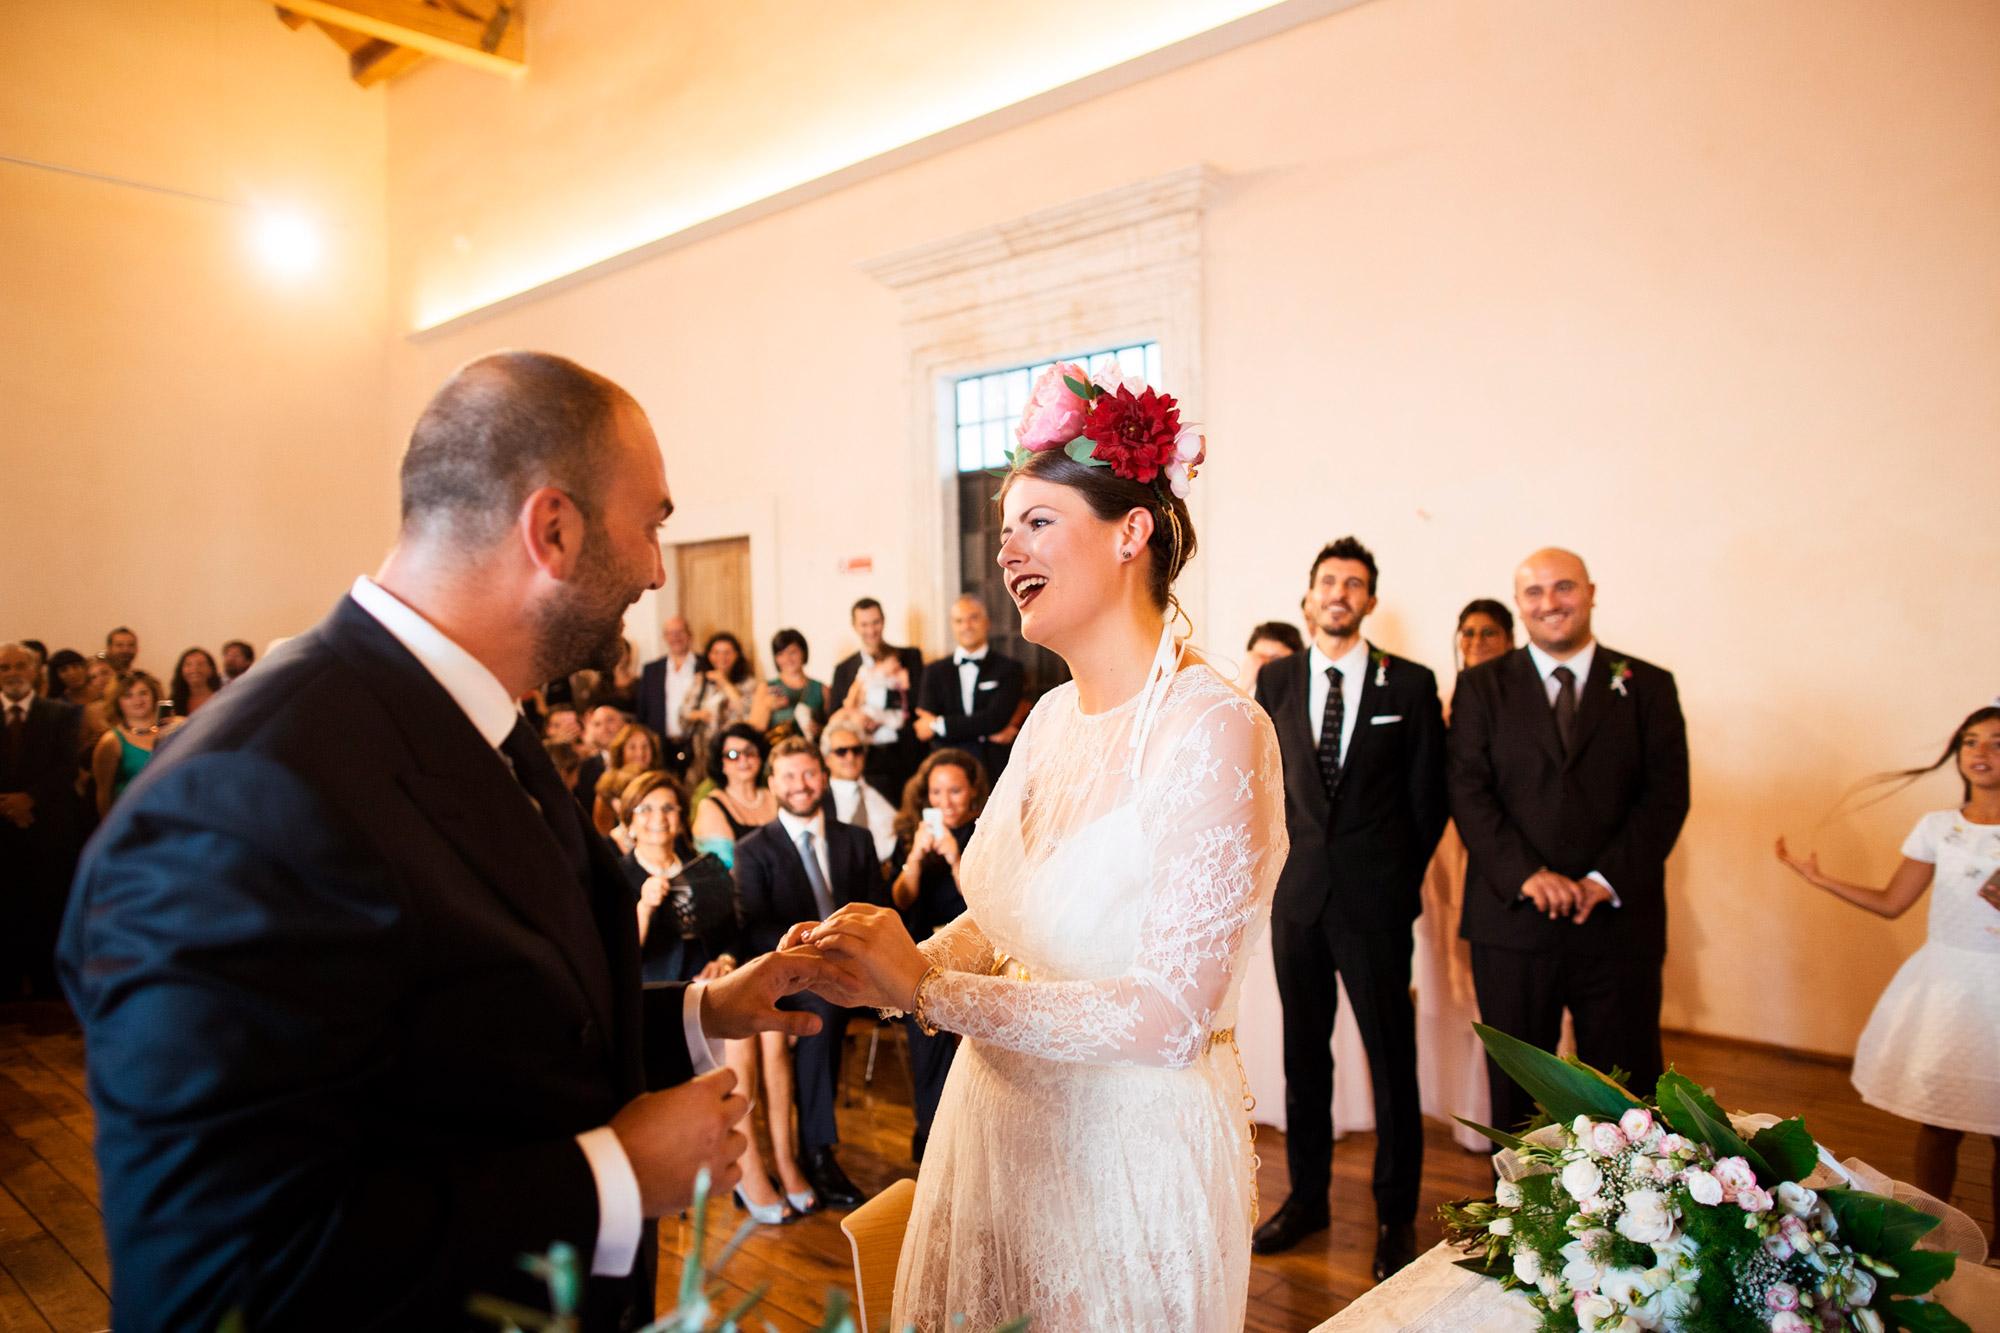 189-FIKUS-PUGLIA-wedding-ostuni-masseria.jpg